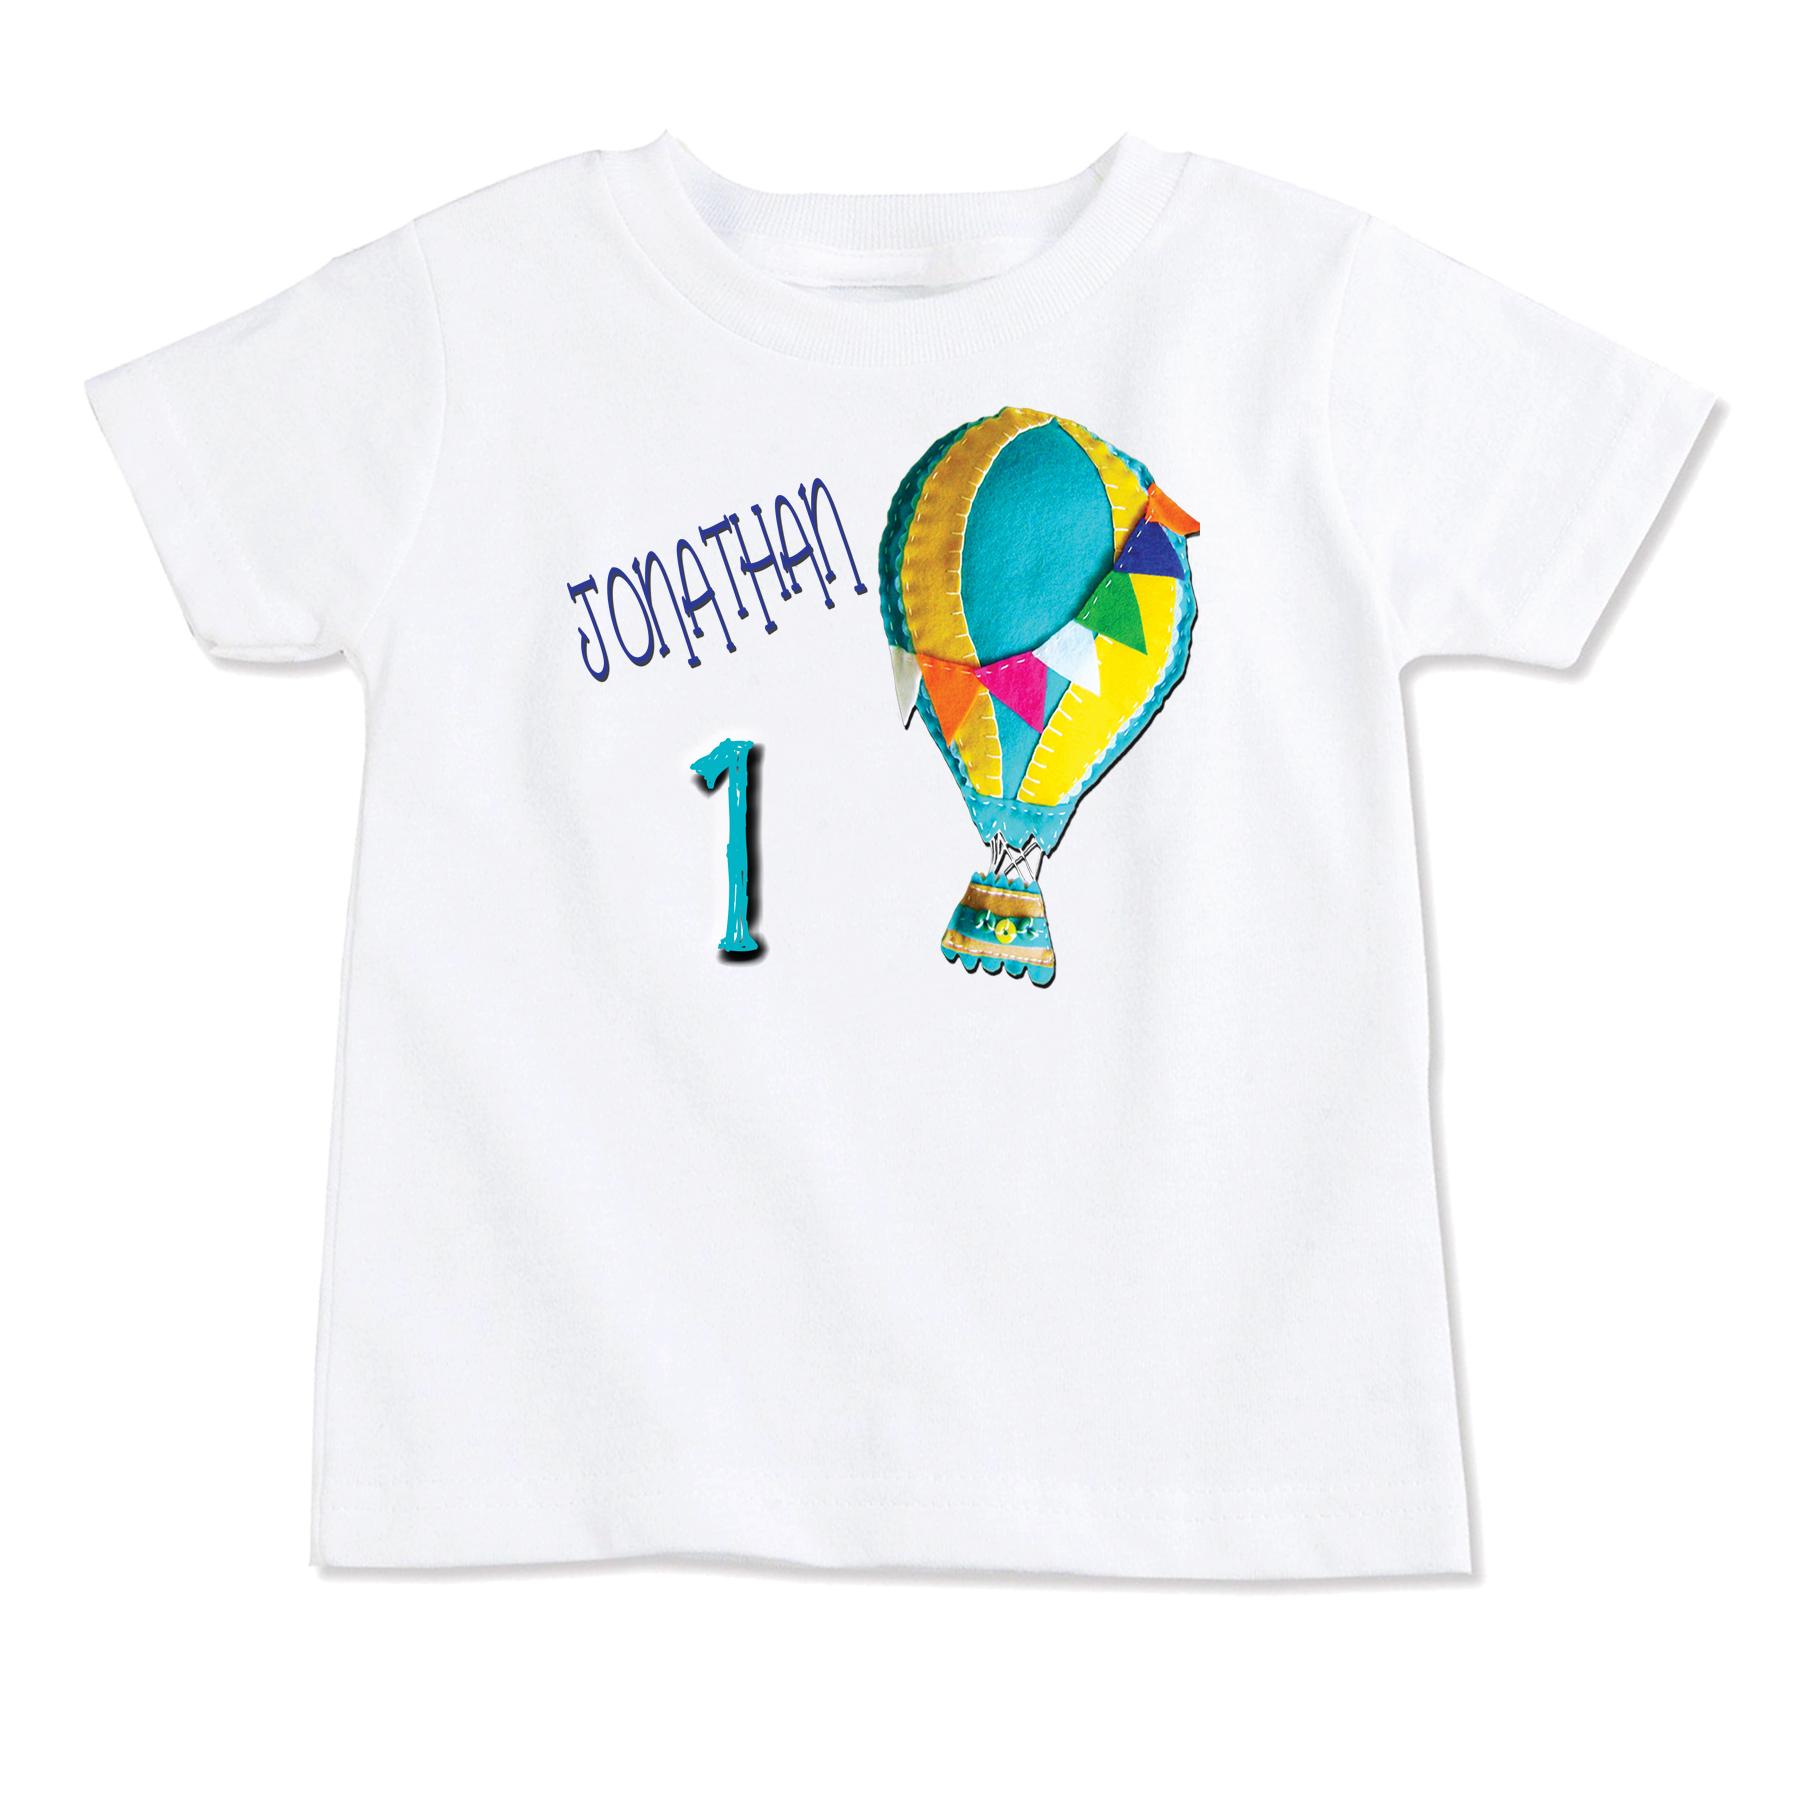 4cfa6a84f126d UP UP Away T-Shirt, Hot Air Balloon T-Shirt, Birthday T-Shirt,Party  T-Shirt,Personalized T-Shirt,Custom T-Shirt,Toddler Tops